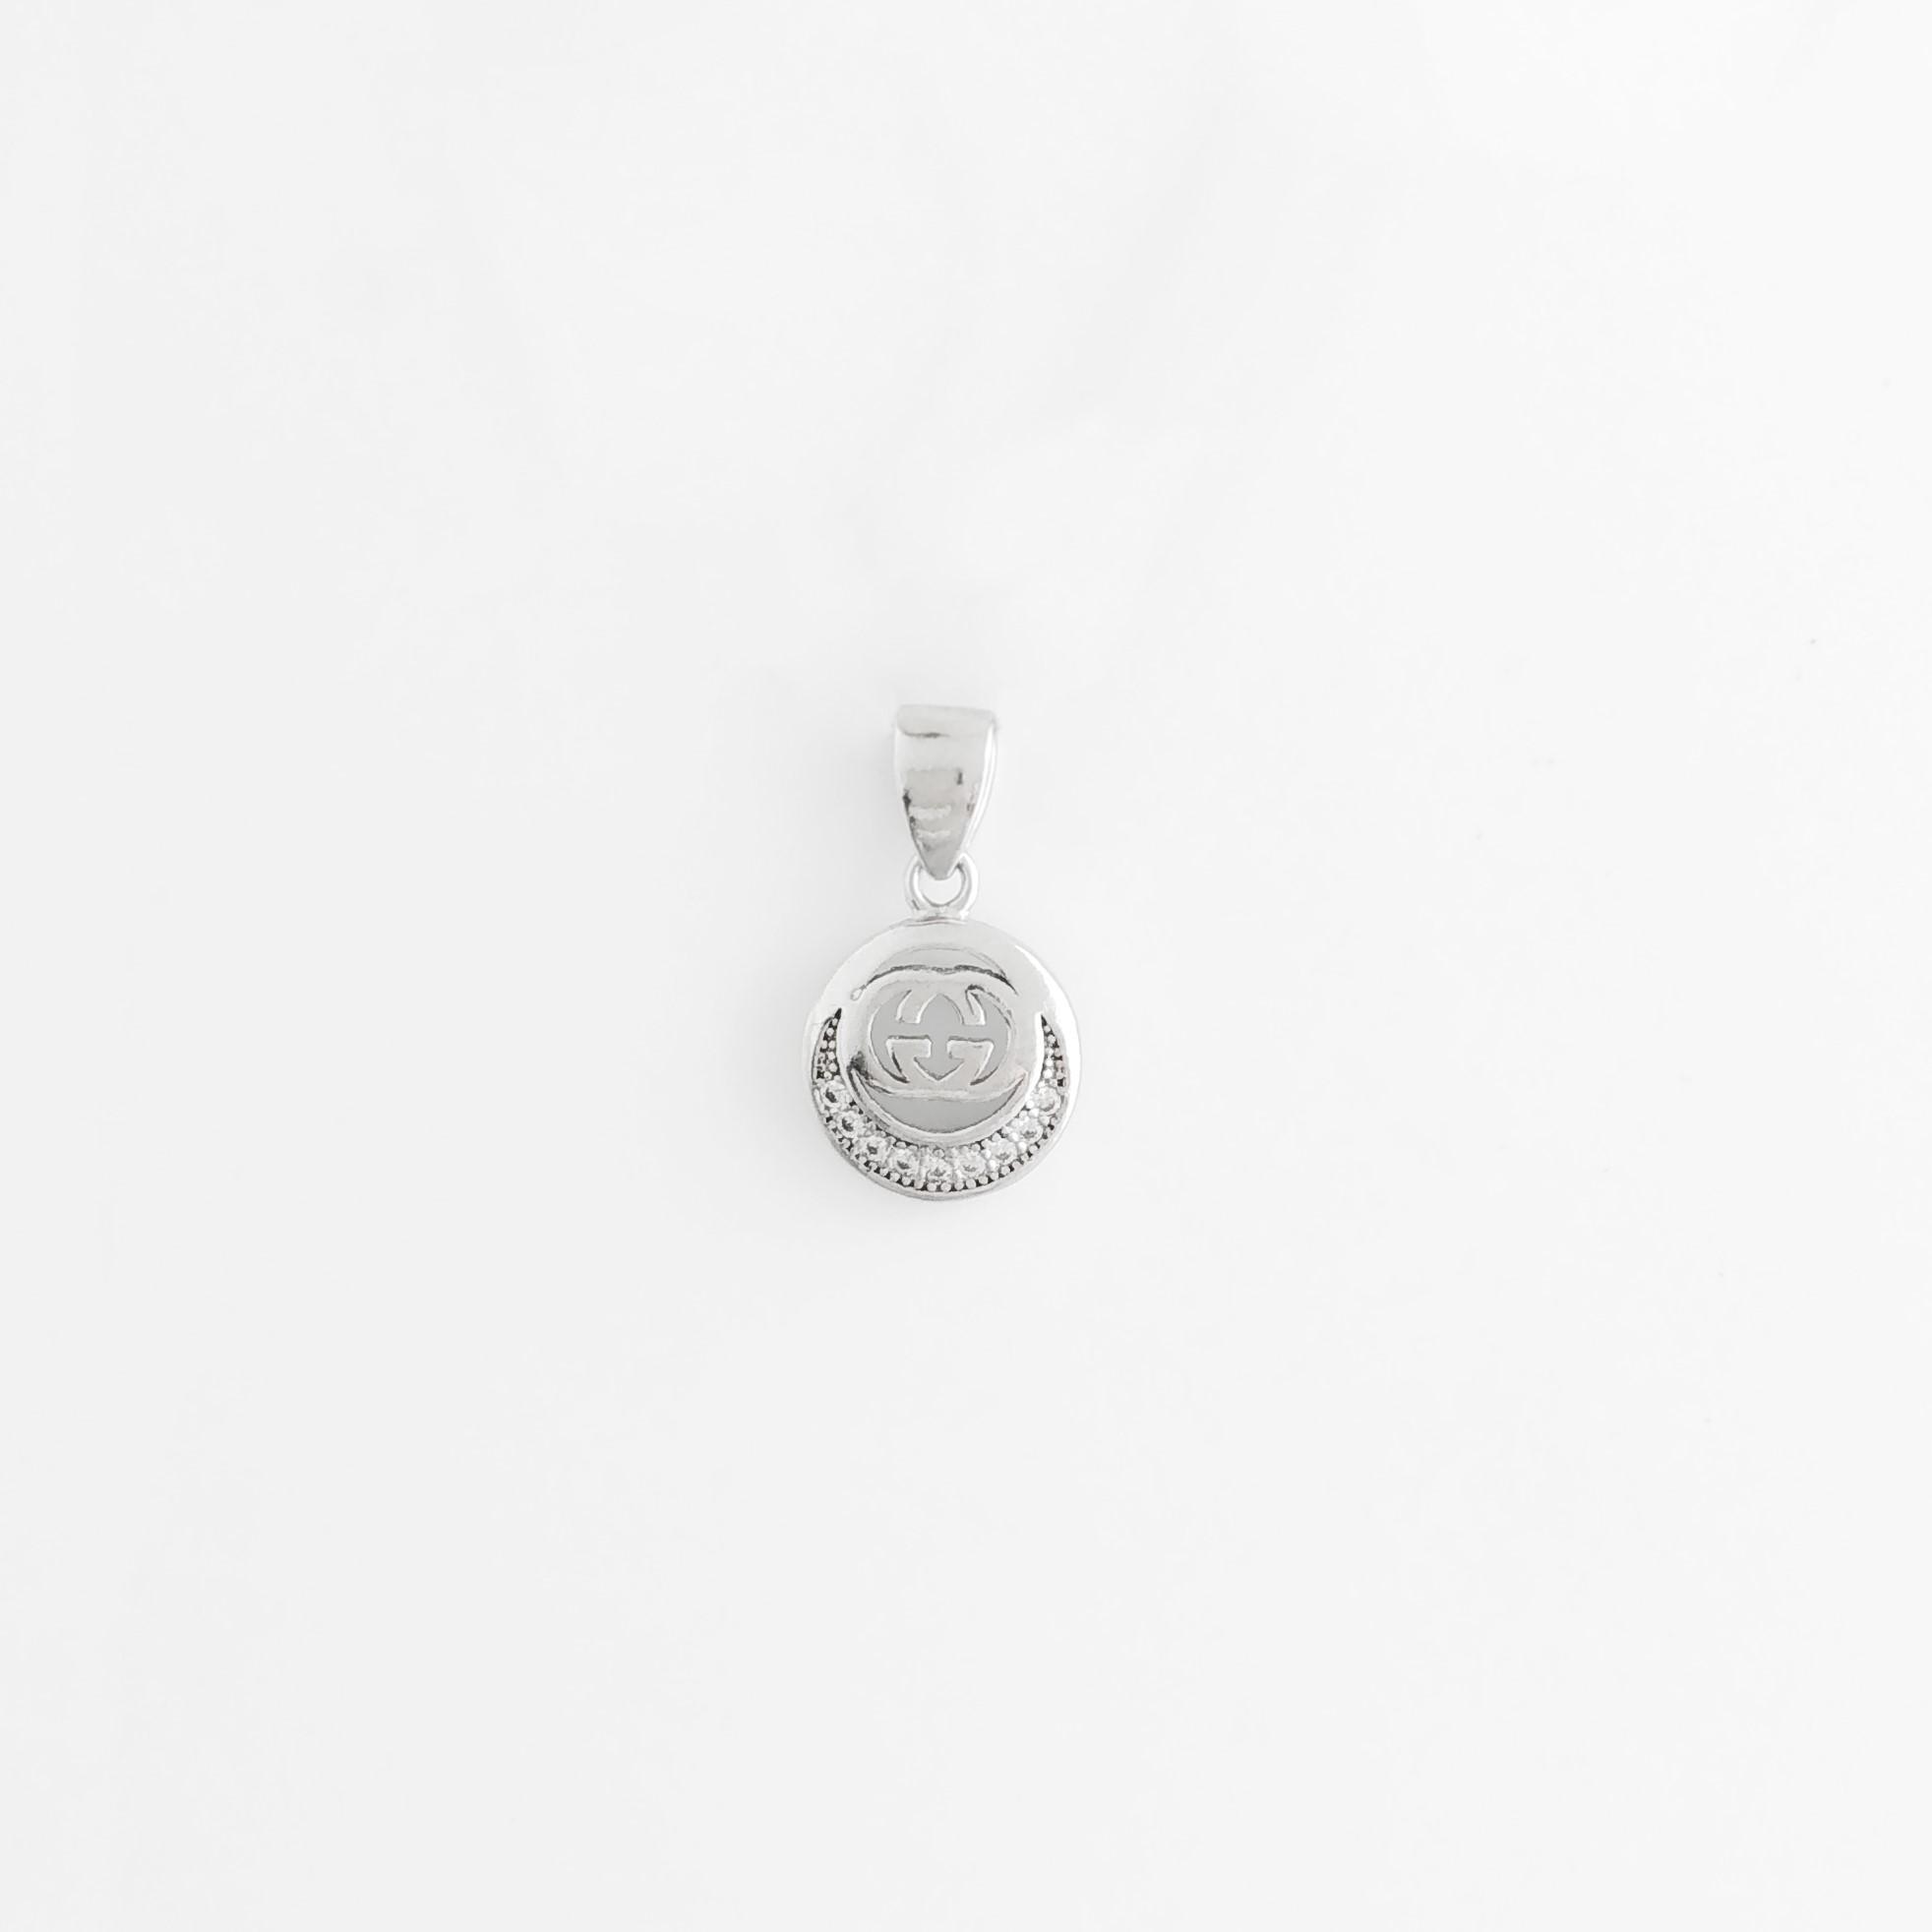 Silver Fashion Pendant